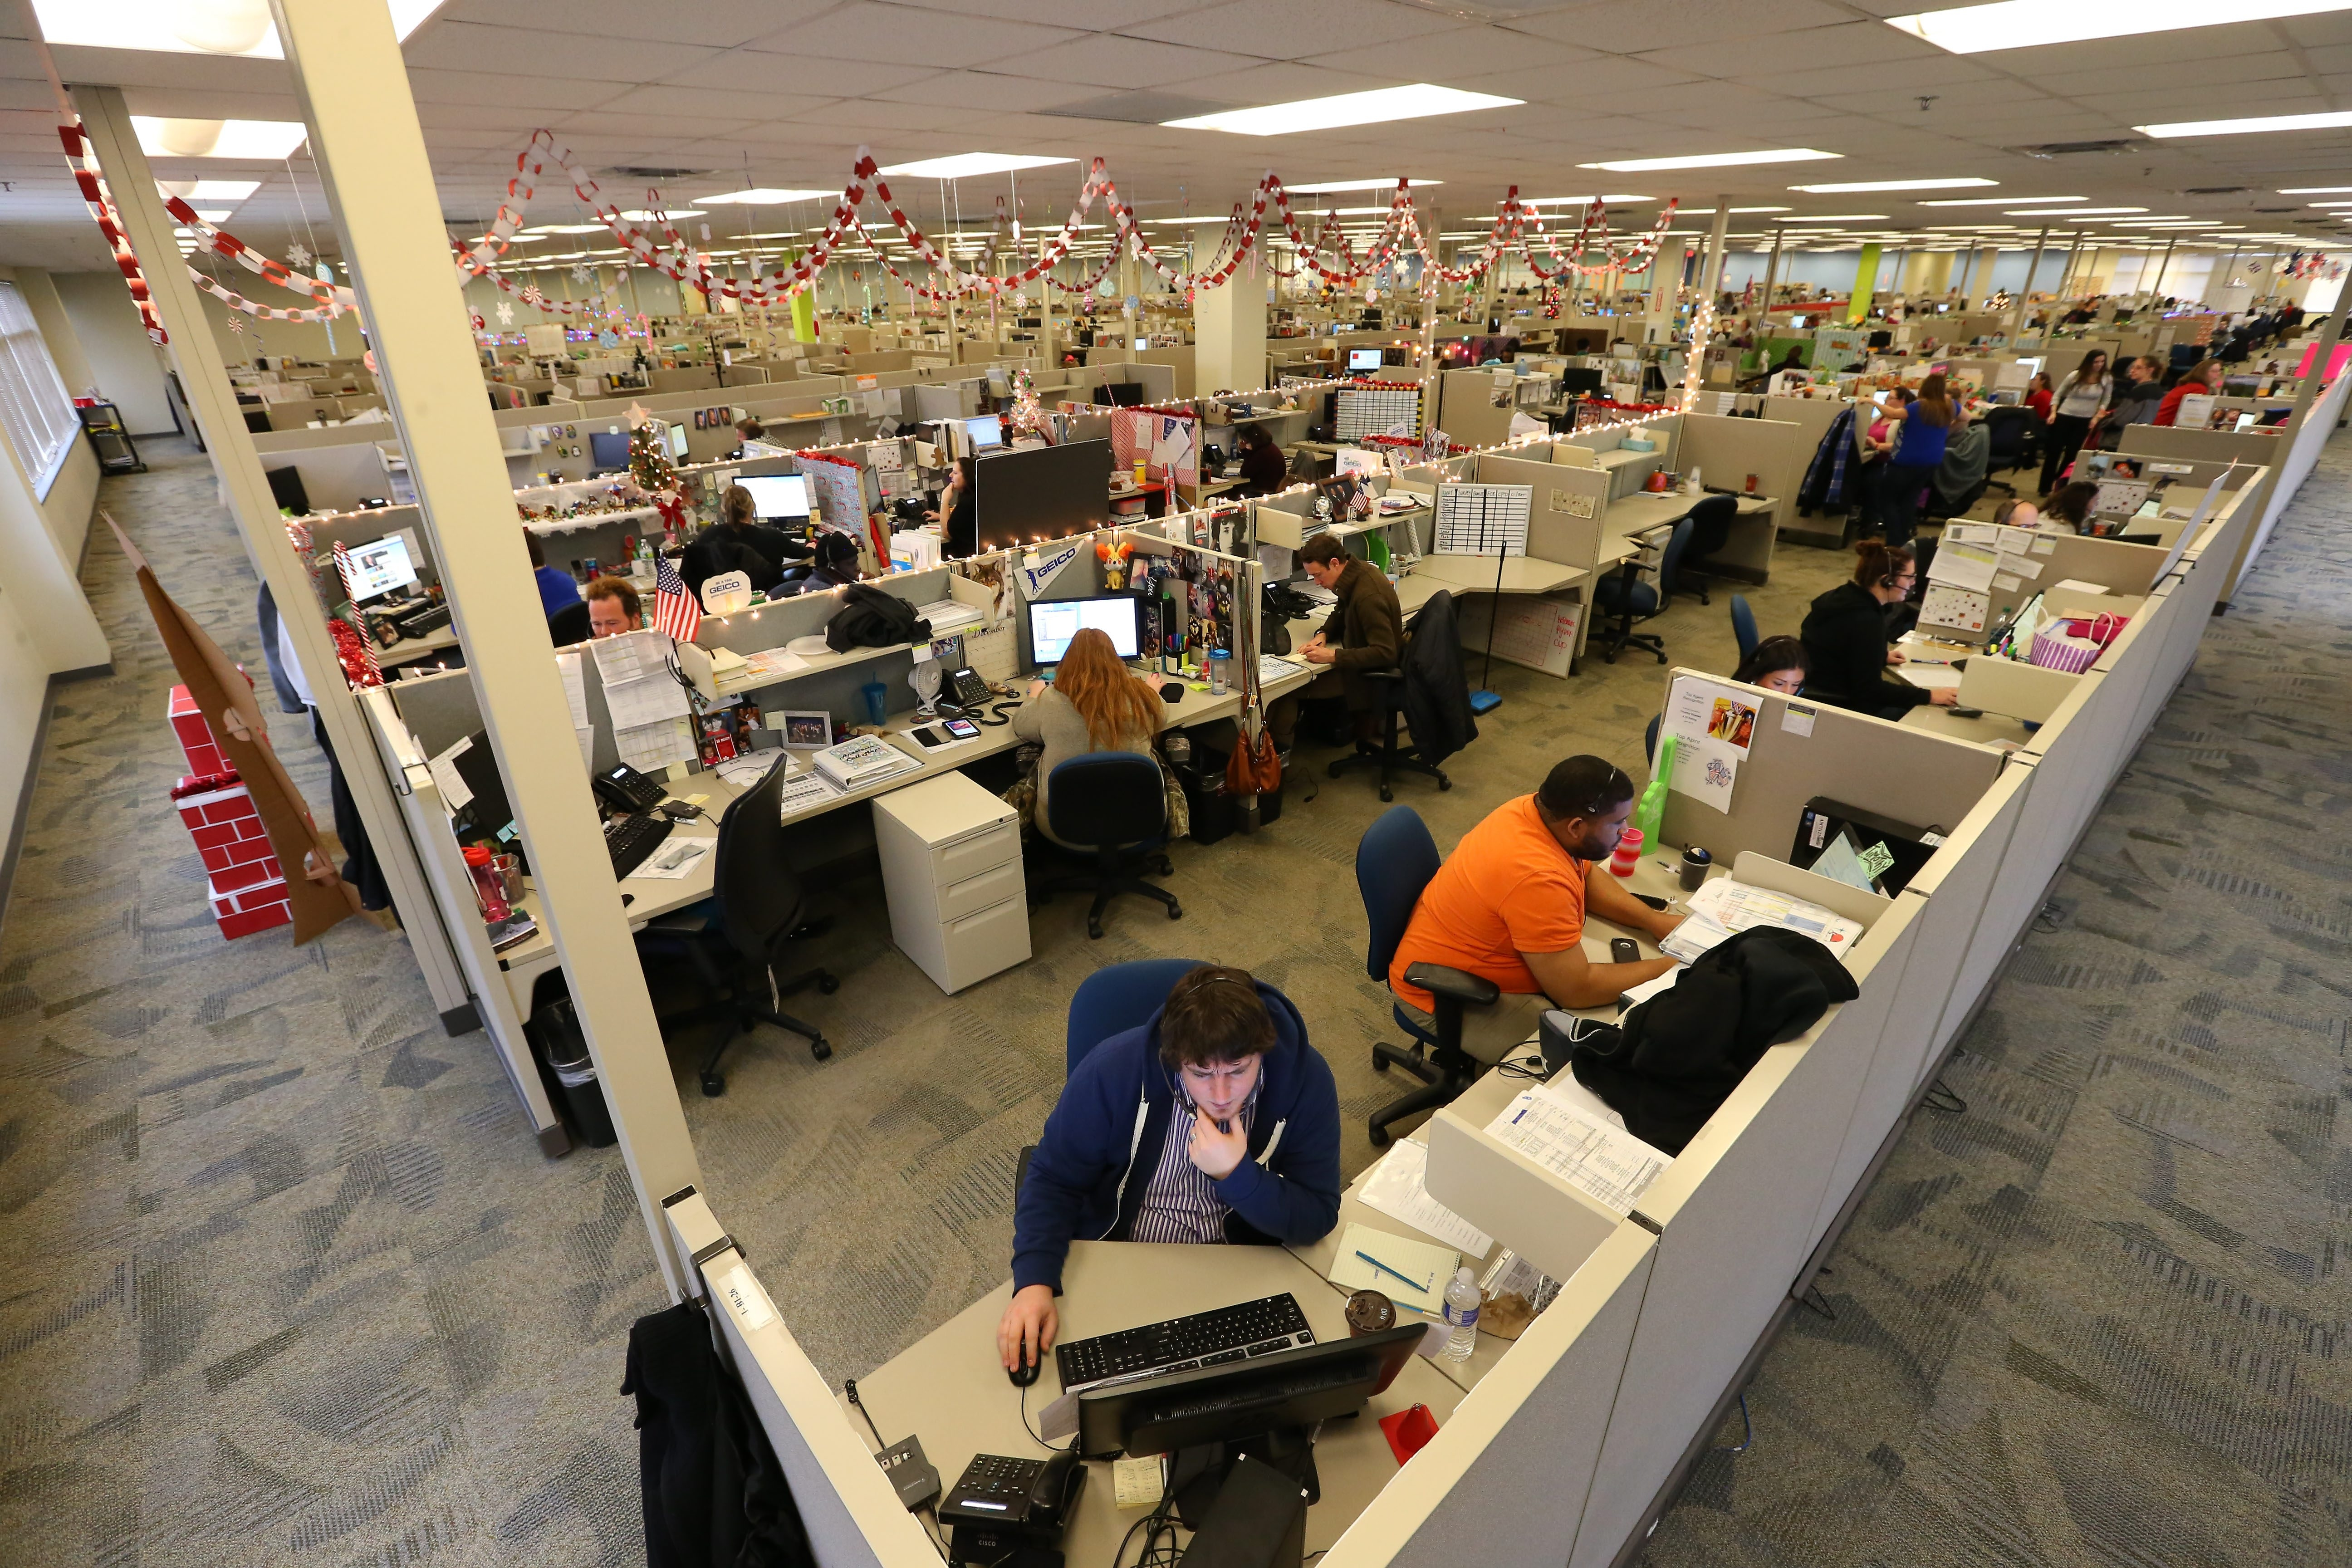 The Buffalo Niagara job market is finally back in better balance, David Robinson says. (Mark Mulville/News file photo)